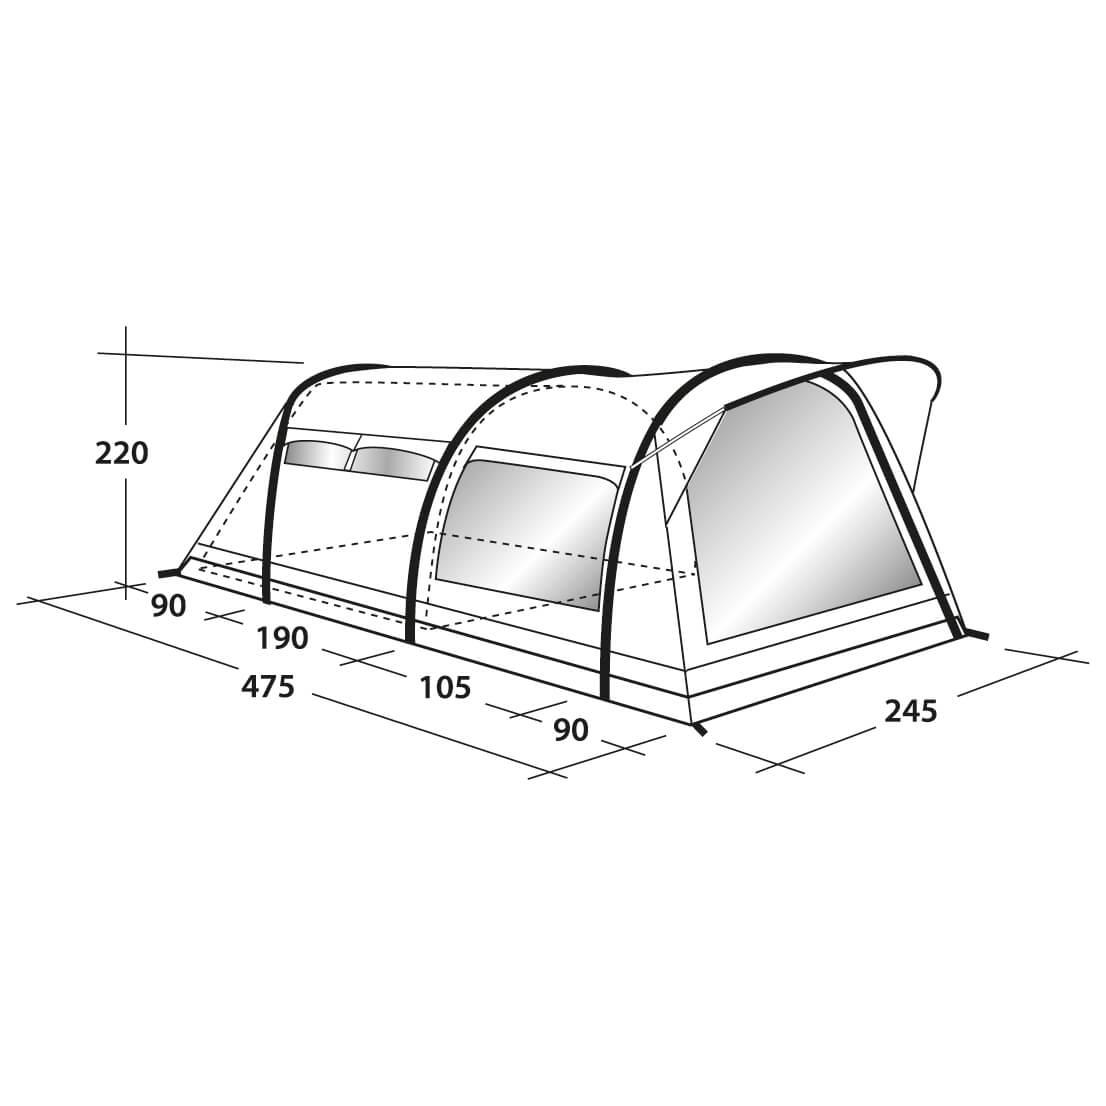 ... Outwell - Huntley 3SATC - 3 man tent ...  sc 1 st  Alpinetrek & Outwell Huntley 3SATC - 3 Man Tent | Free UK Delivery | Alpinetrek ...